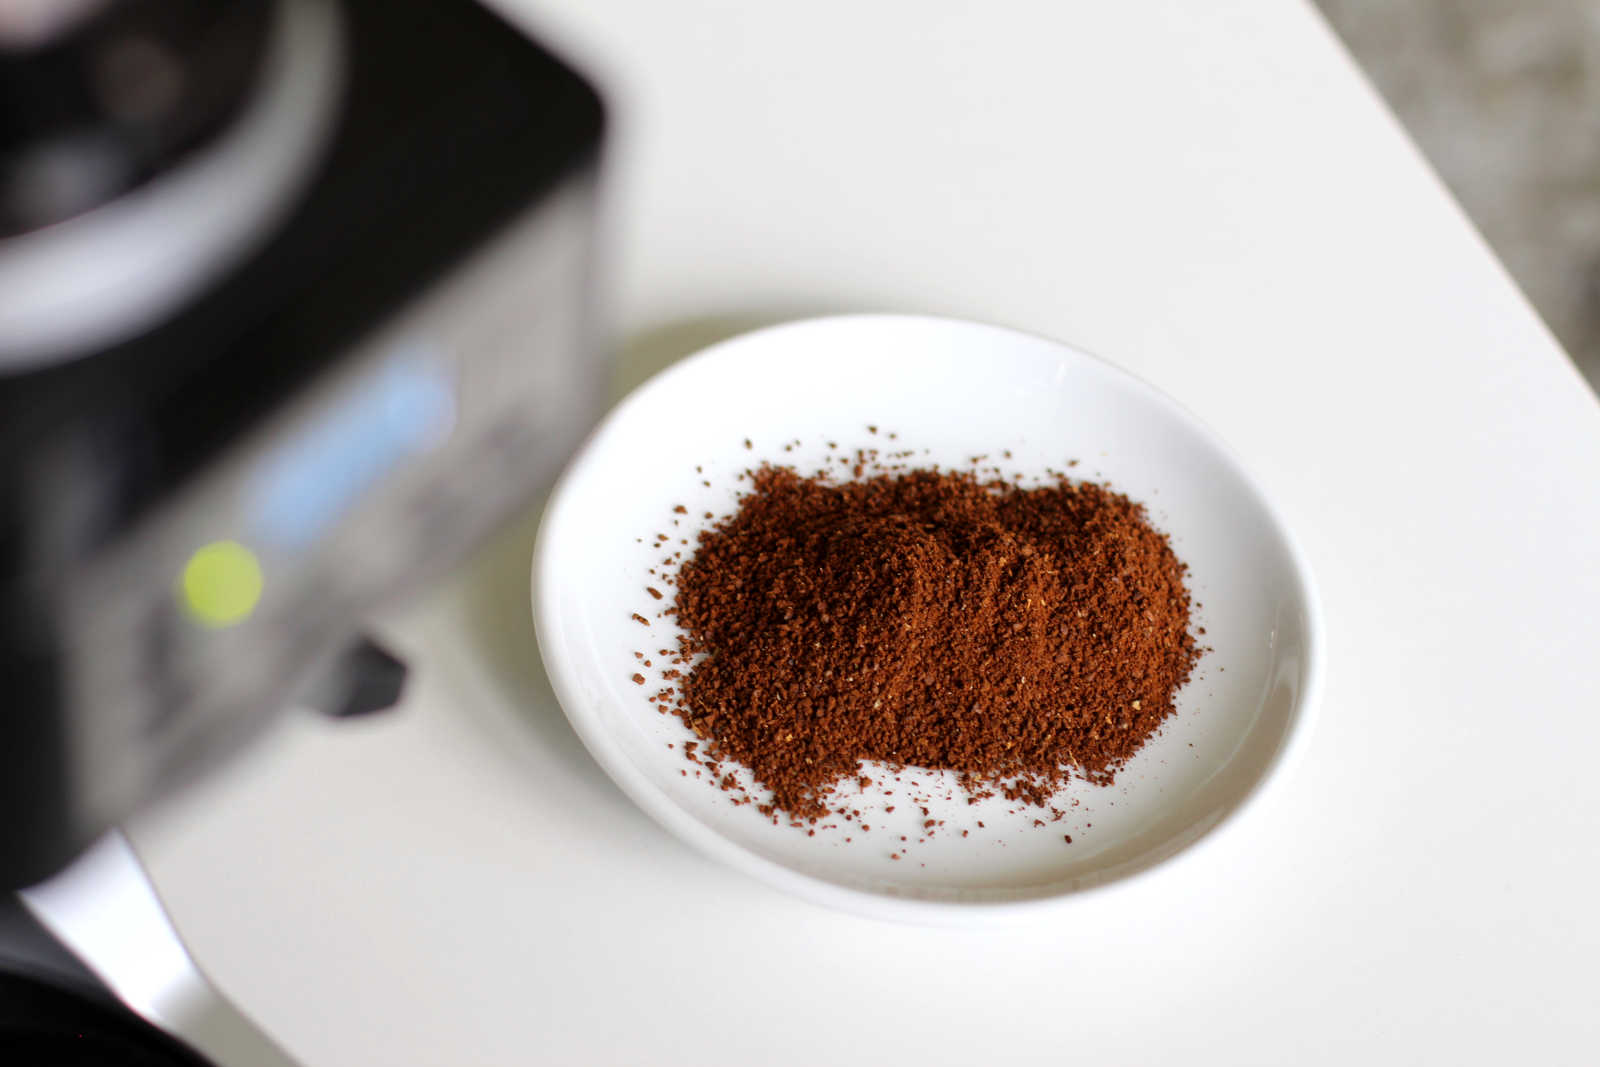 baratza-sette-270_kaffee-mahlen